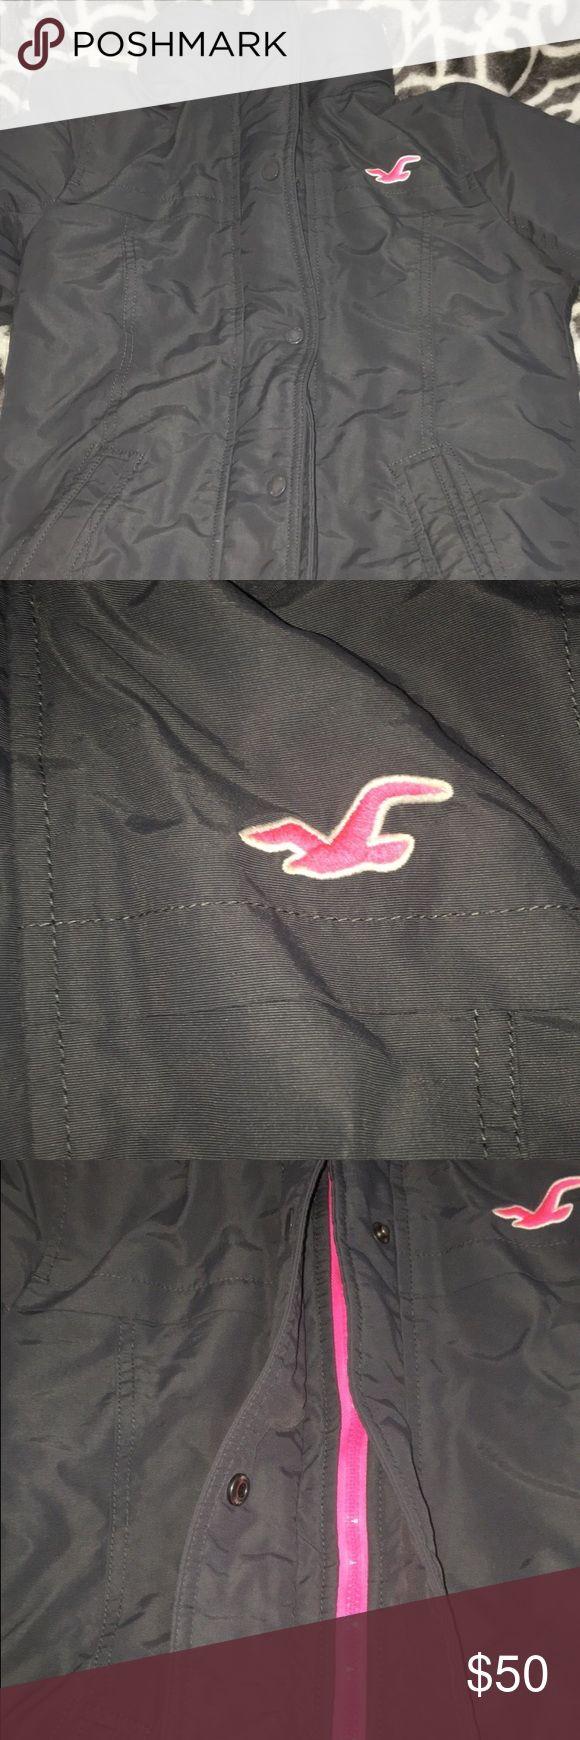 Hollister Jacket Hollister Jacket,size XS , brand new! Hollister Jackets & Coats